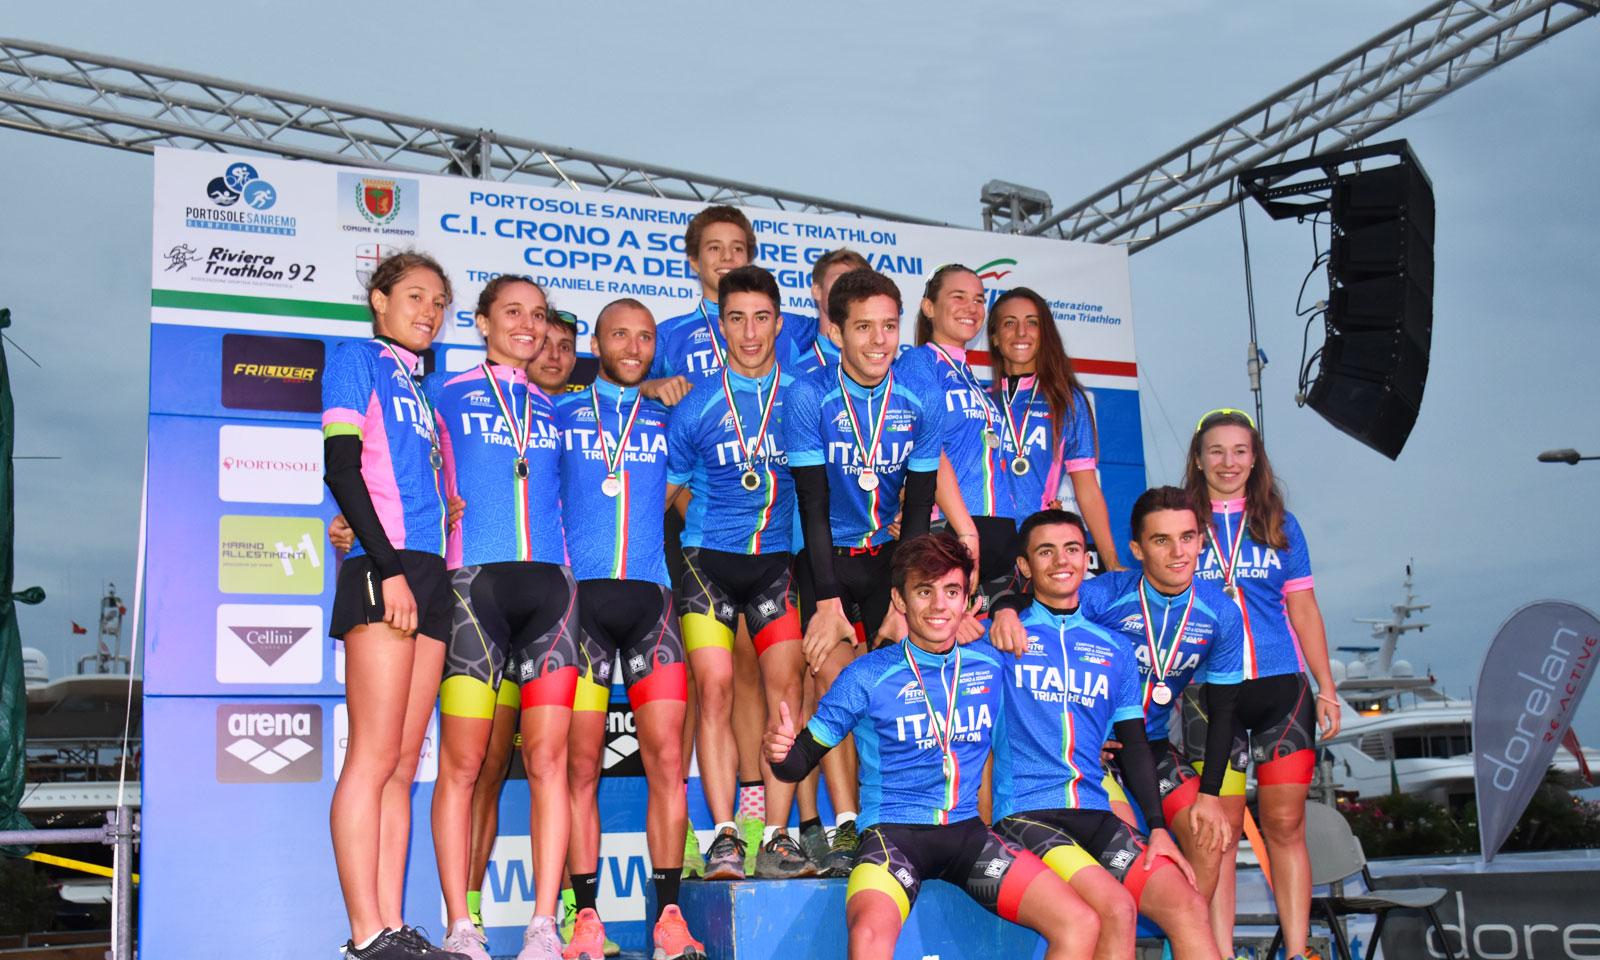 triathlon-pavese-raschiani-pavia-cycling-running-139